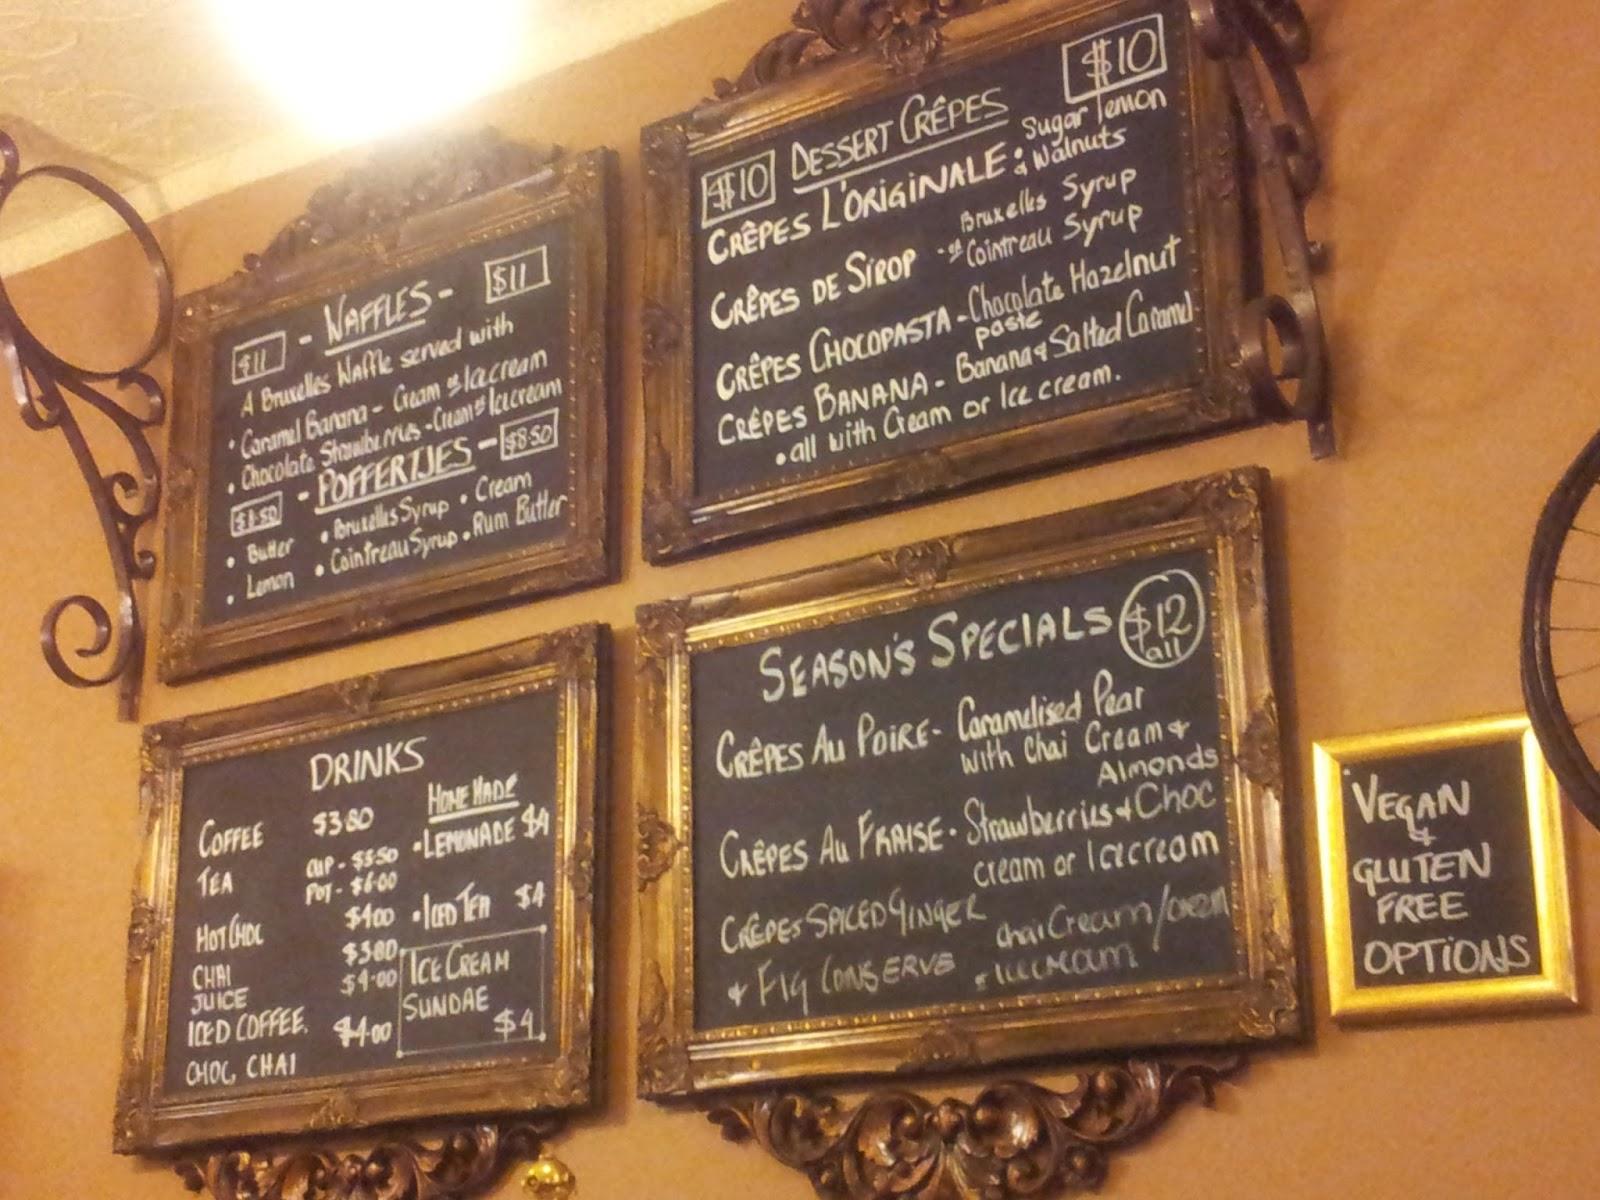 Creperie Bruxelles, Menu, Adelaide, Crepe, Dessert